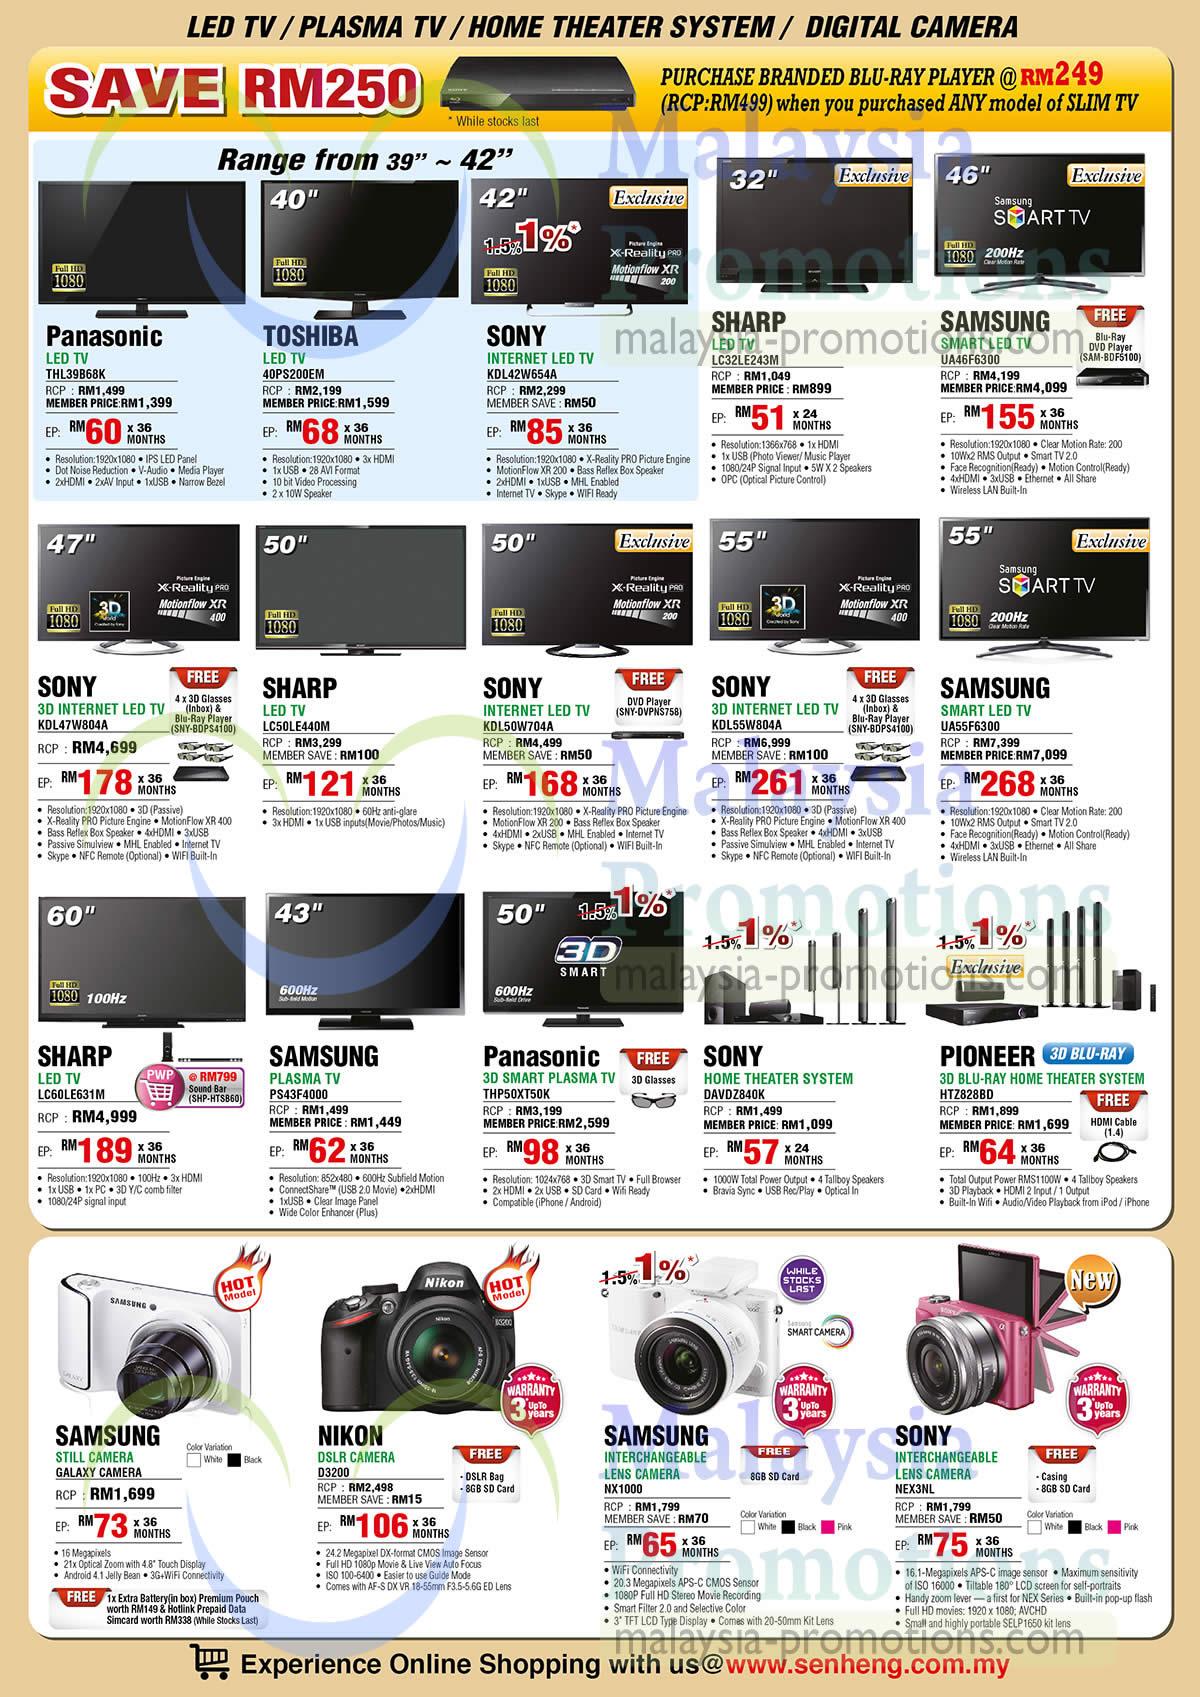 TVs, Home Theatre Systems, Cameras, Panasonic, Toshiba, Sony, Sharp, Samsung, Pioneer, Nikon